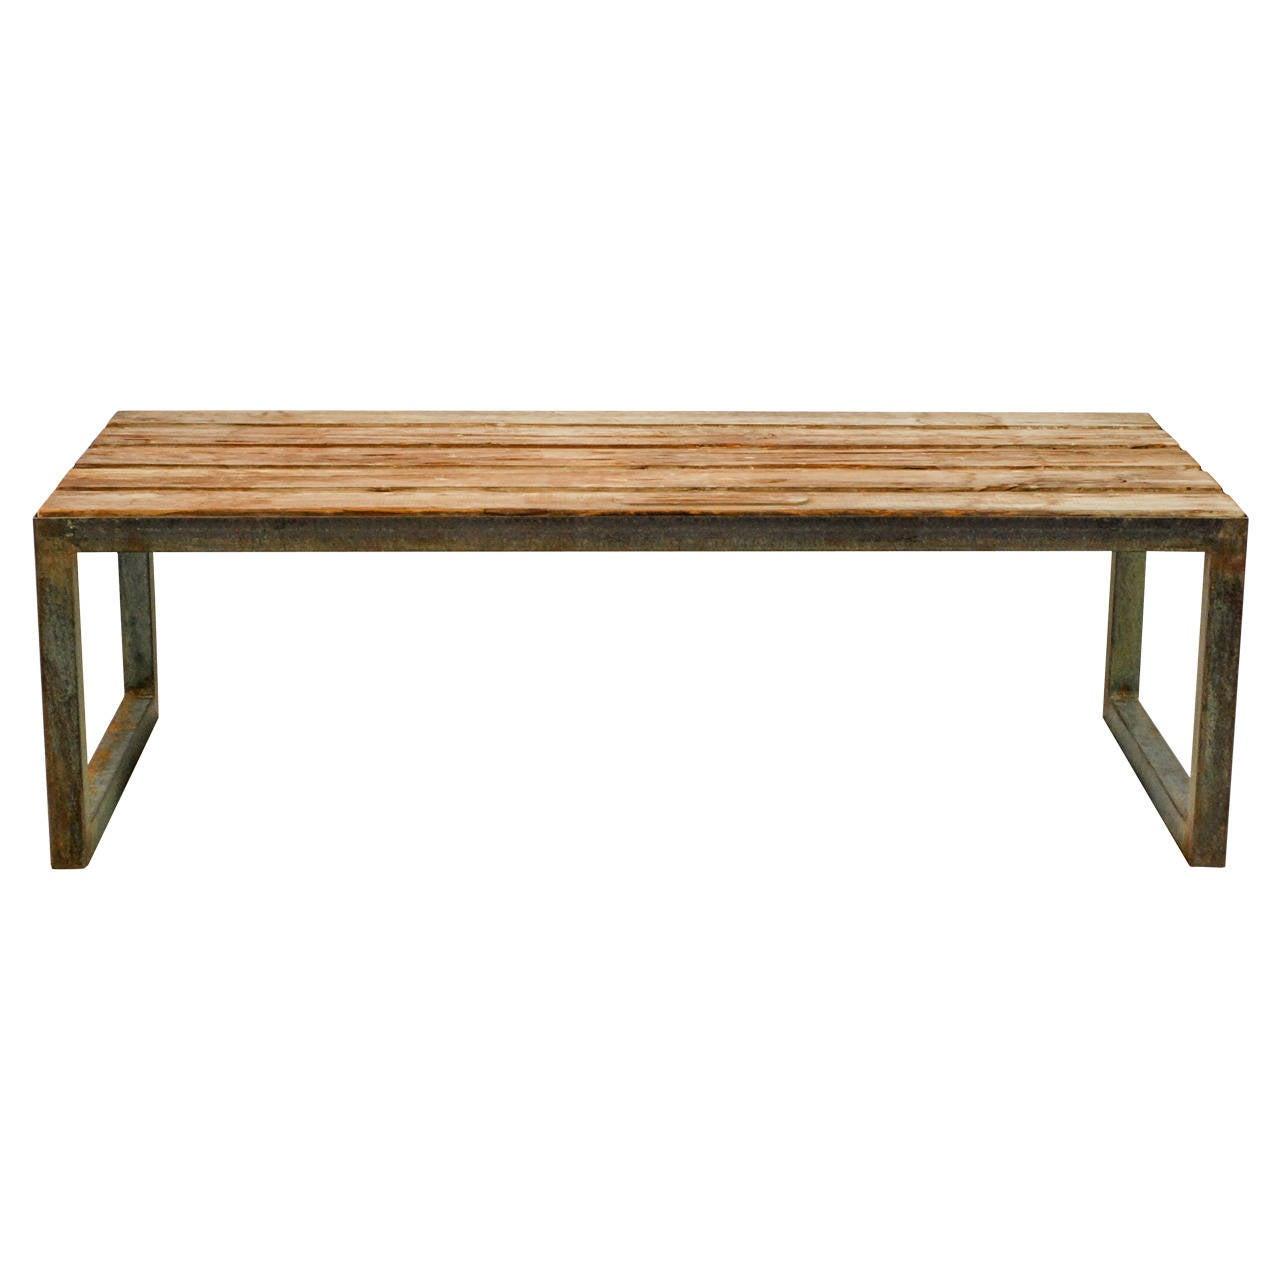 Antique Single Teak Slab Top Coffee Table At 1stdibs: Vintage Teak And Steel Coffee Table At 1stdibs